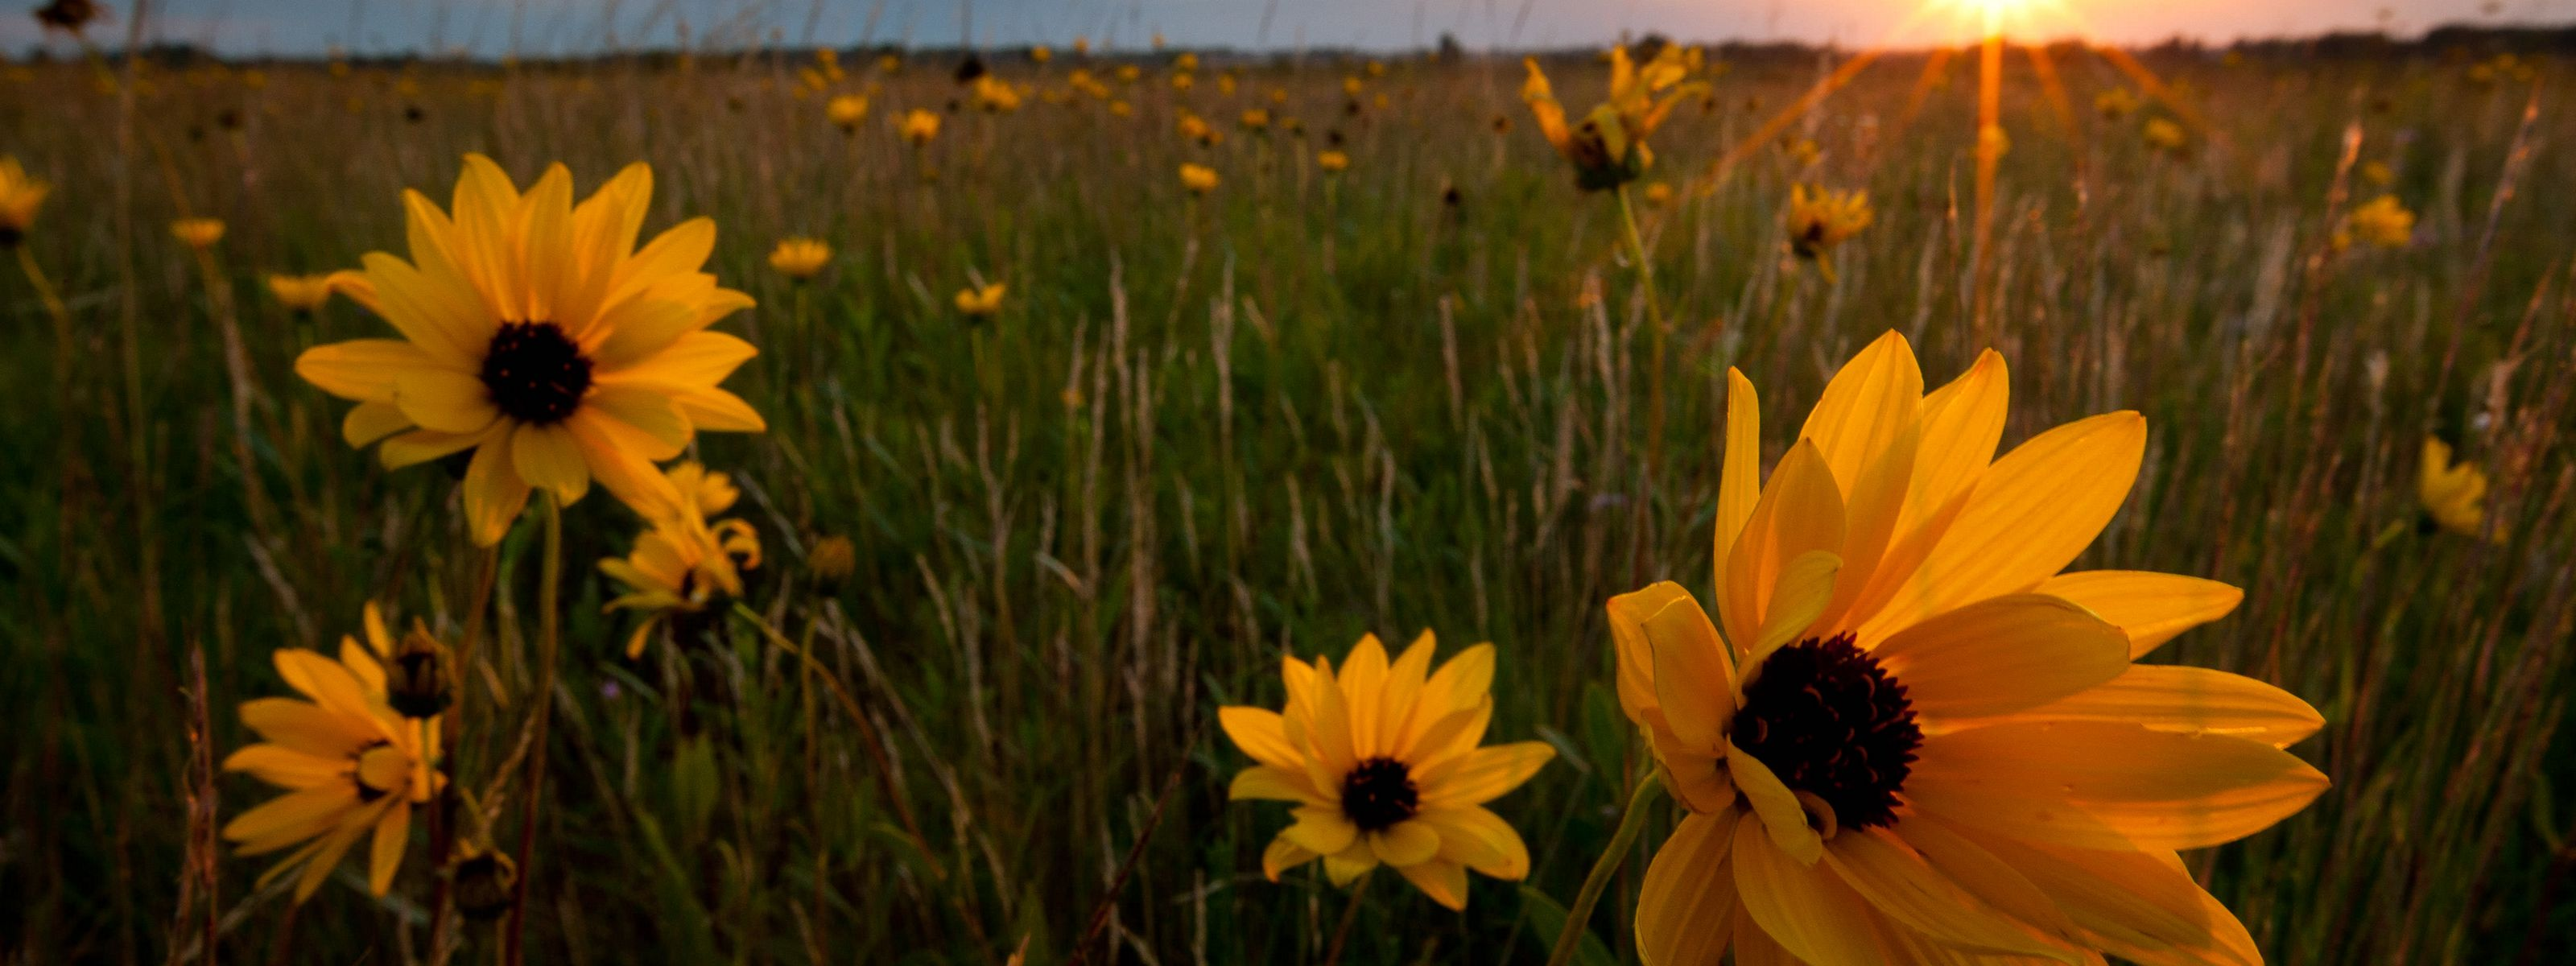 at TNC's Bluestem Prairie Preserve in Minnesota.